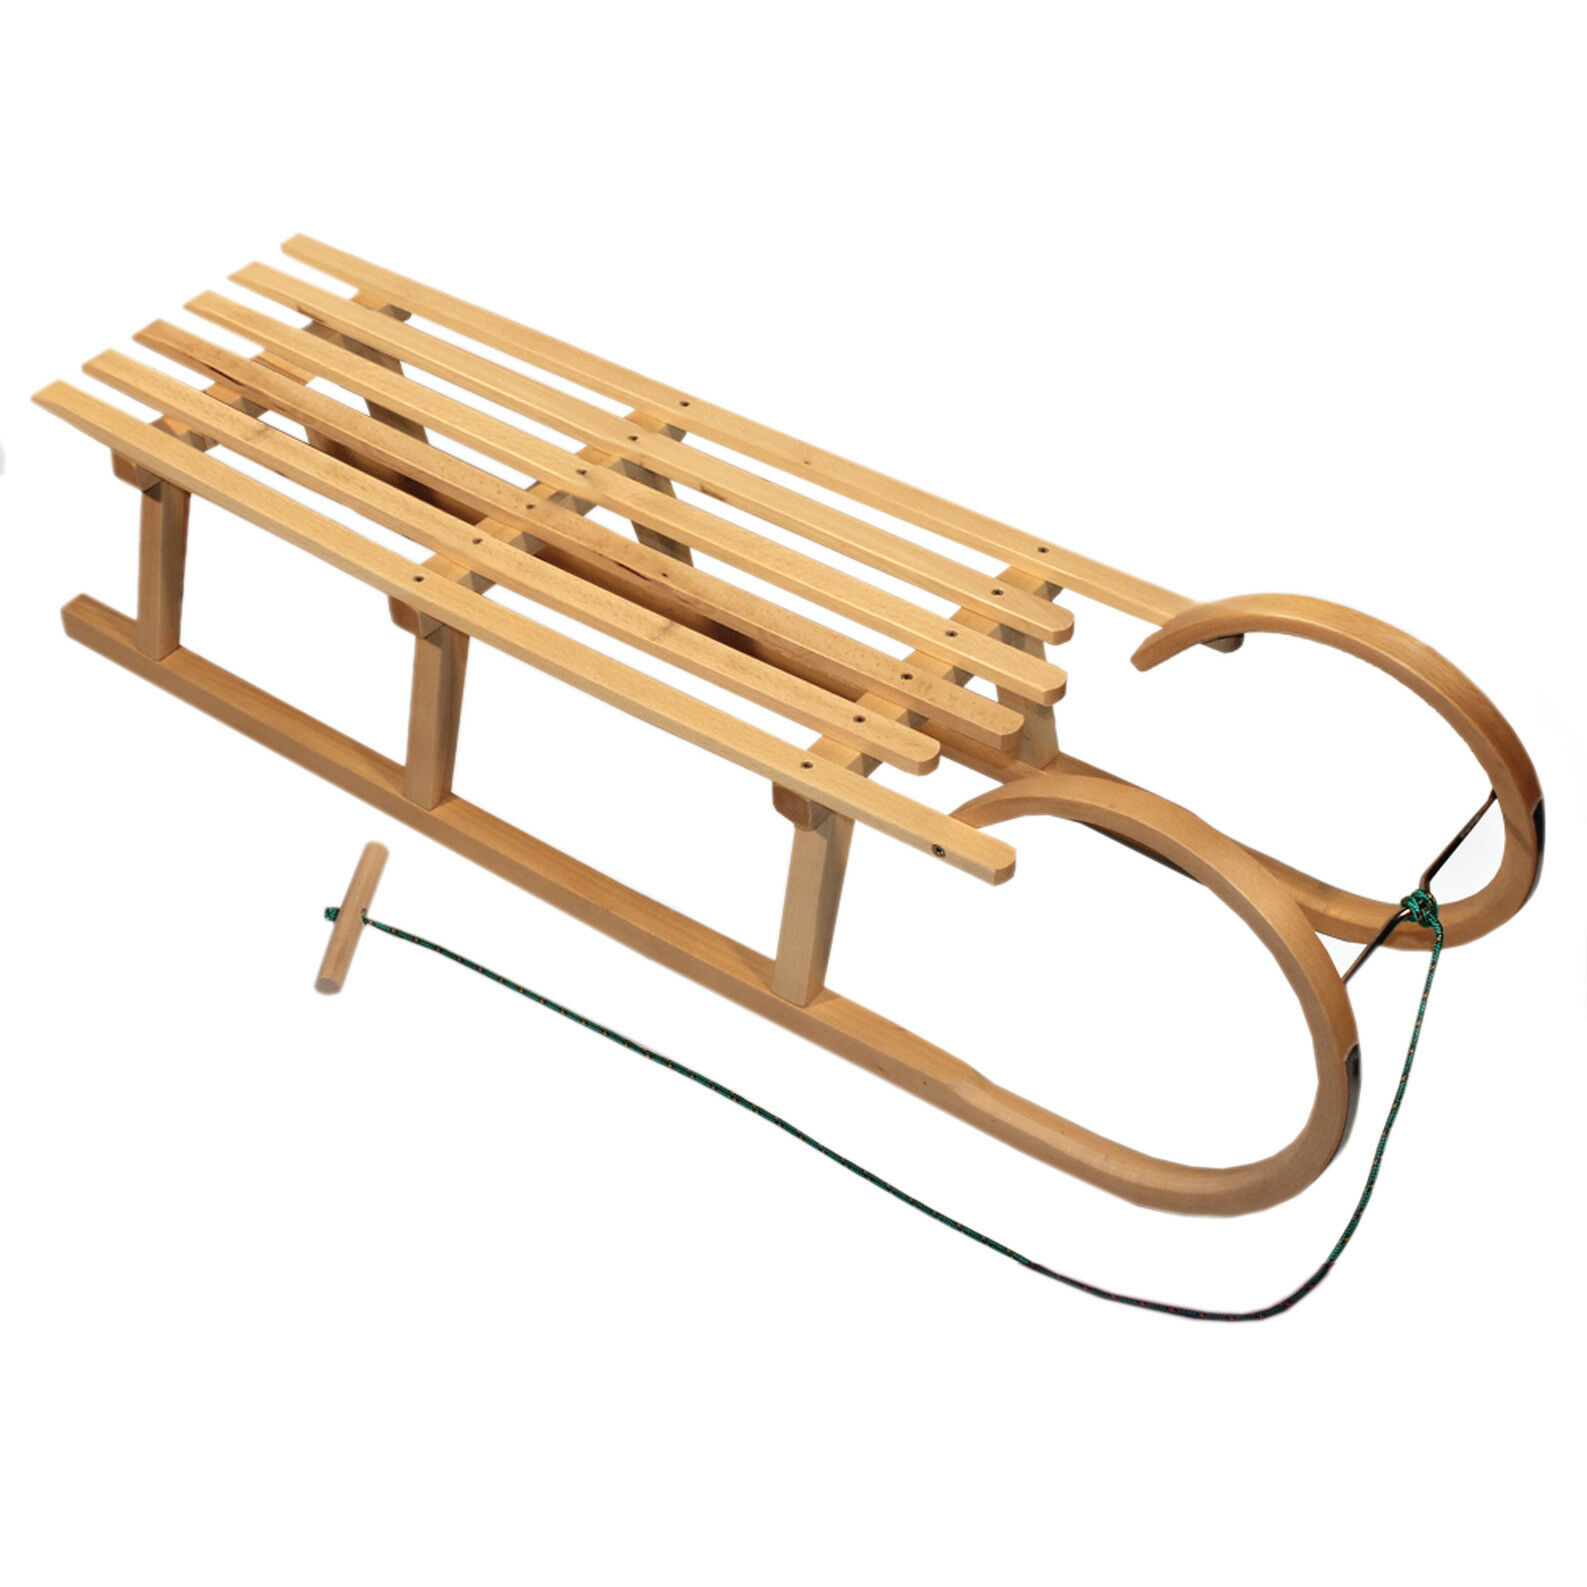 Bambiniwelt Trineo de Madera Hörnerrodel Niños Tirador Cuerda 100cm